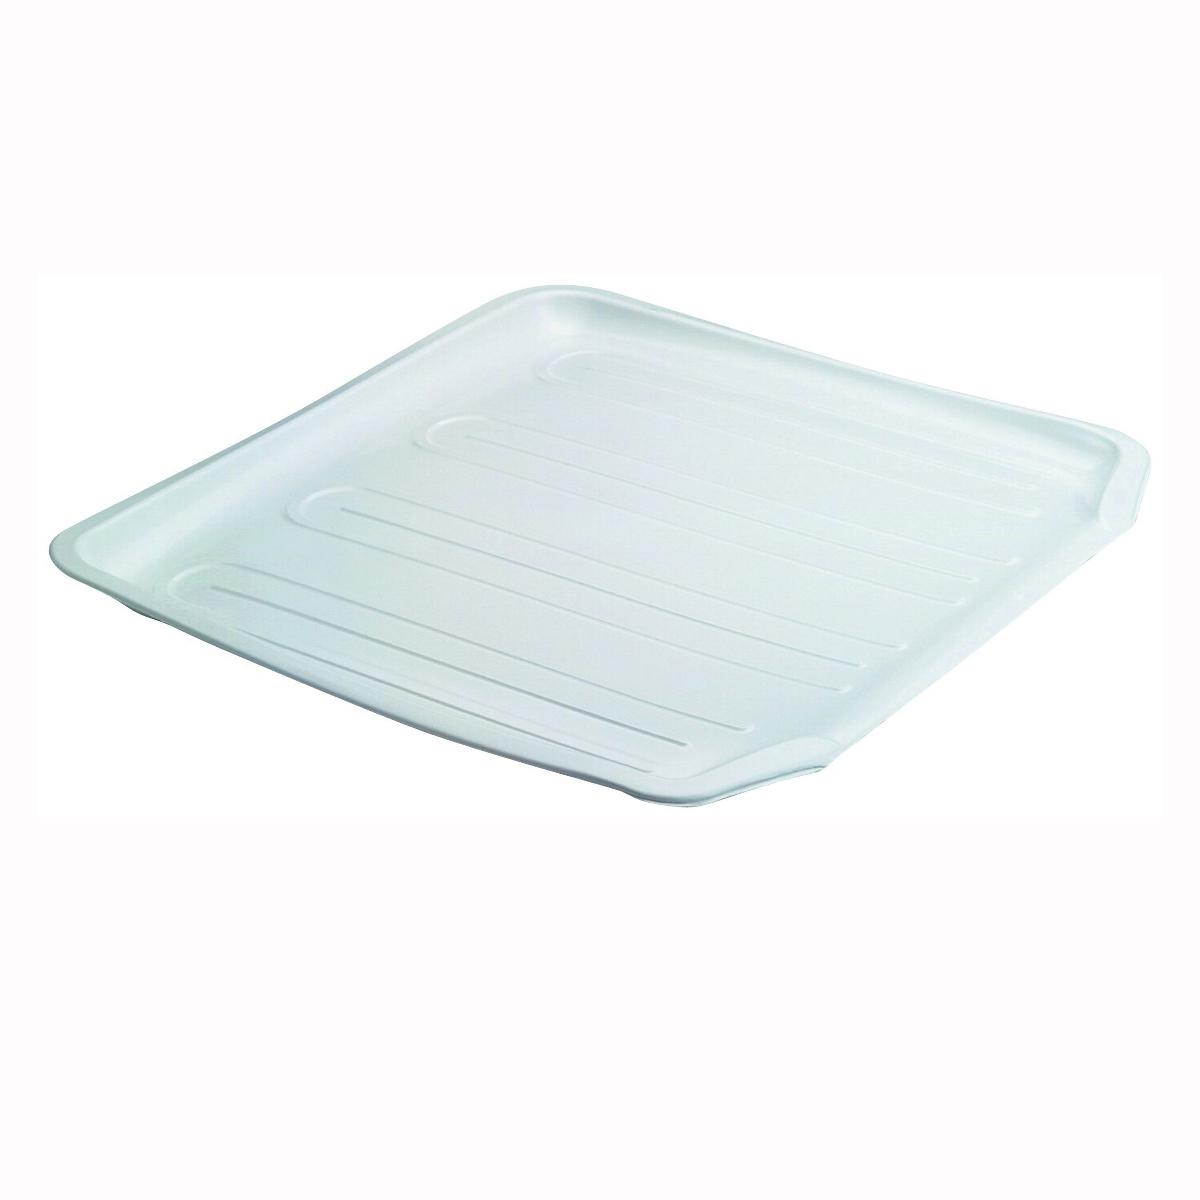 Picture of Rubbermaid 1180MAWHT Drain Board, 15.38 in L, 14.38 in W, 1.3 in H, Plastic, White